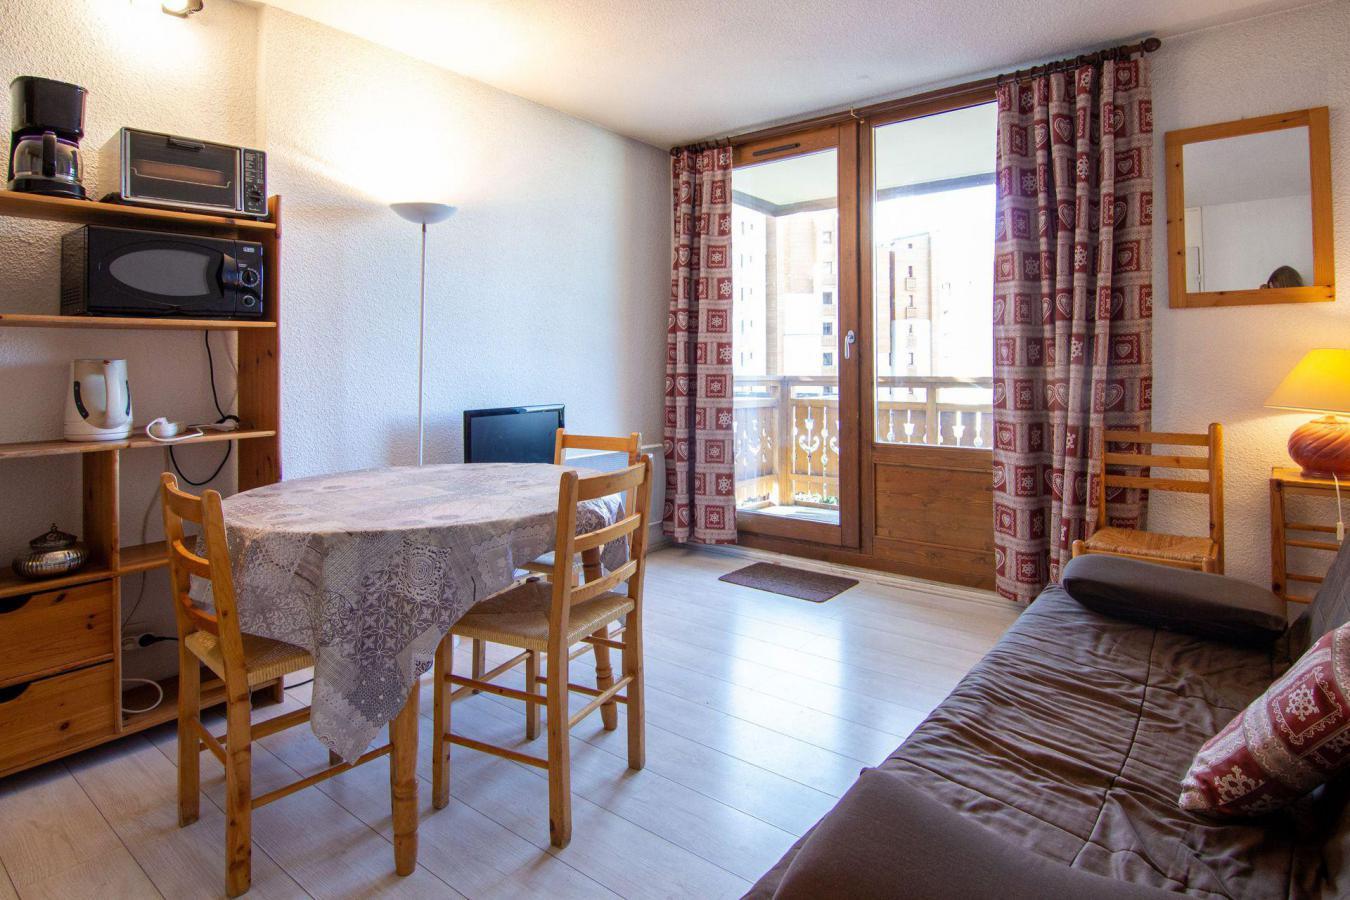 Location au ski Studio 4 personnes (103) - Residence Roche Blanche - Val Thorens - Kitchenette